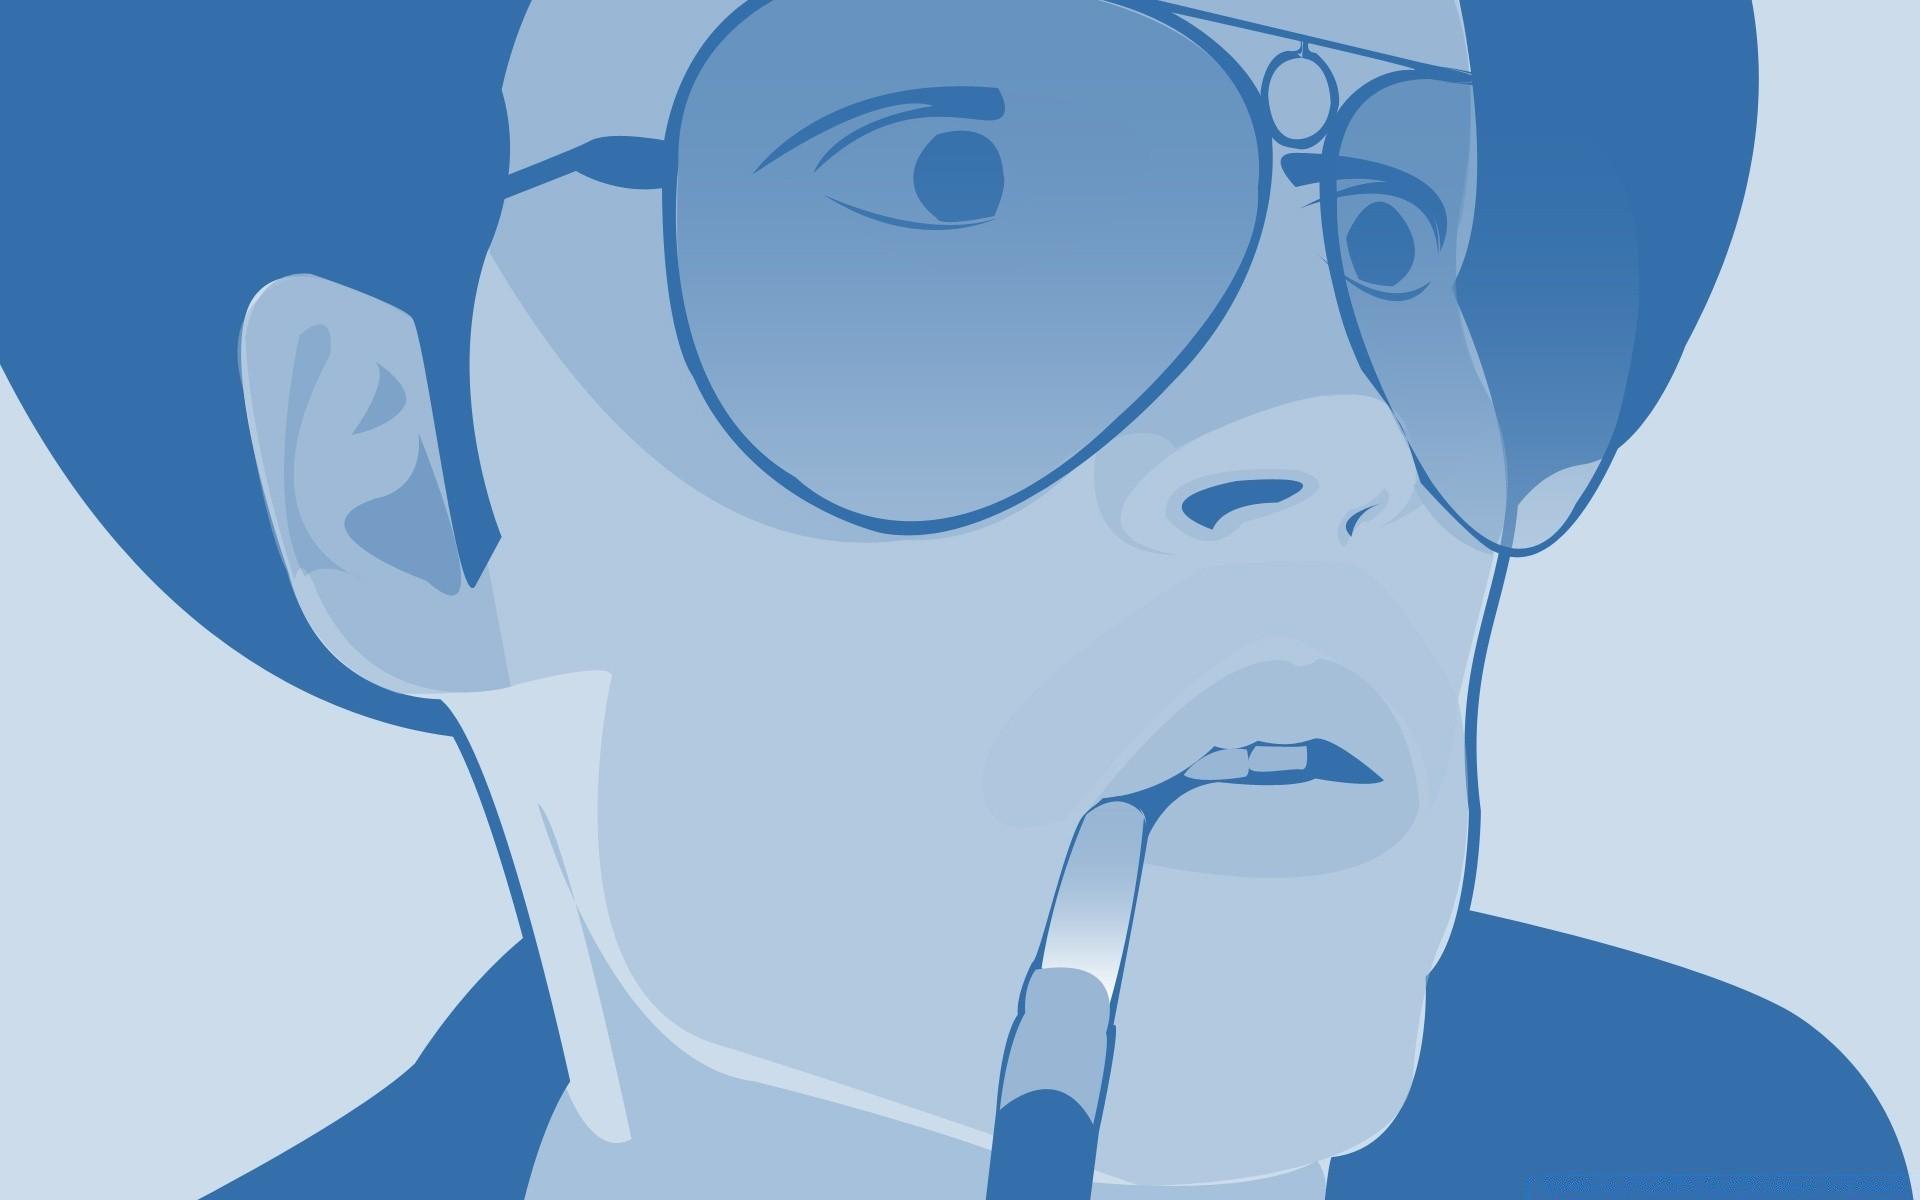 Fear And Loathing In Las Vegas Johnny Depp Free Wallpapers